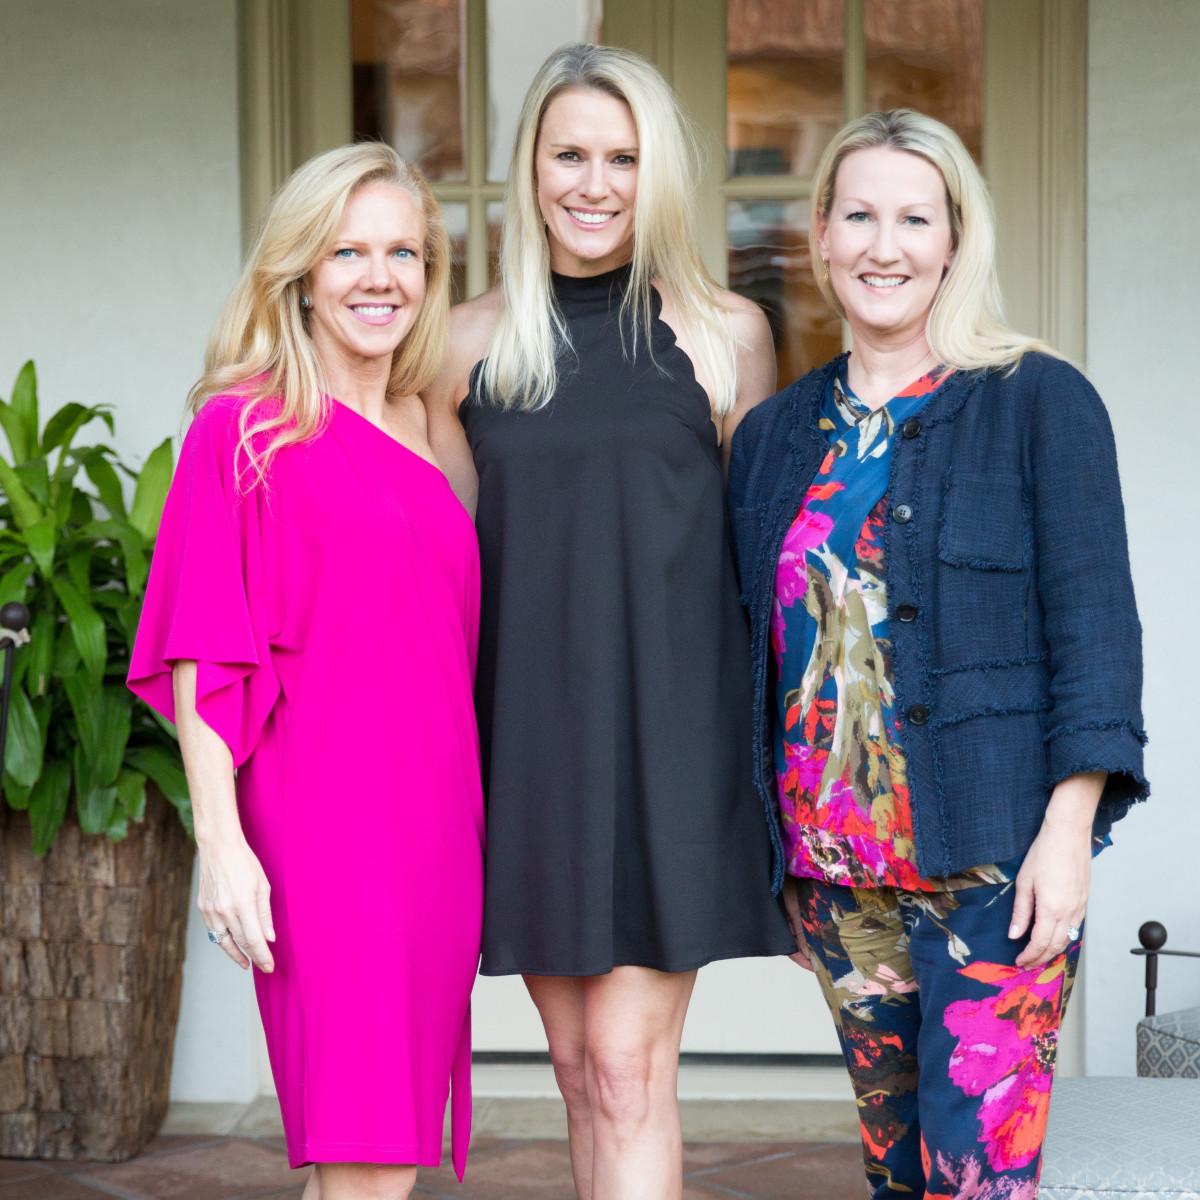 Kelly Perkins, Heather Randall, Lisa Singleton, Trailblazer